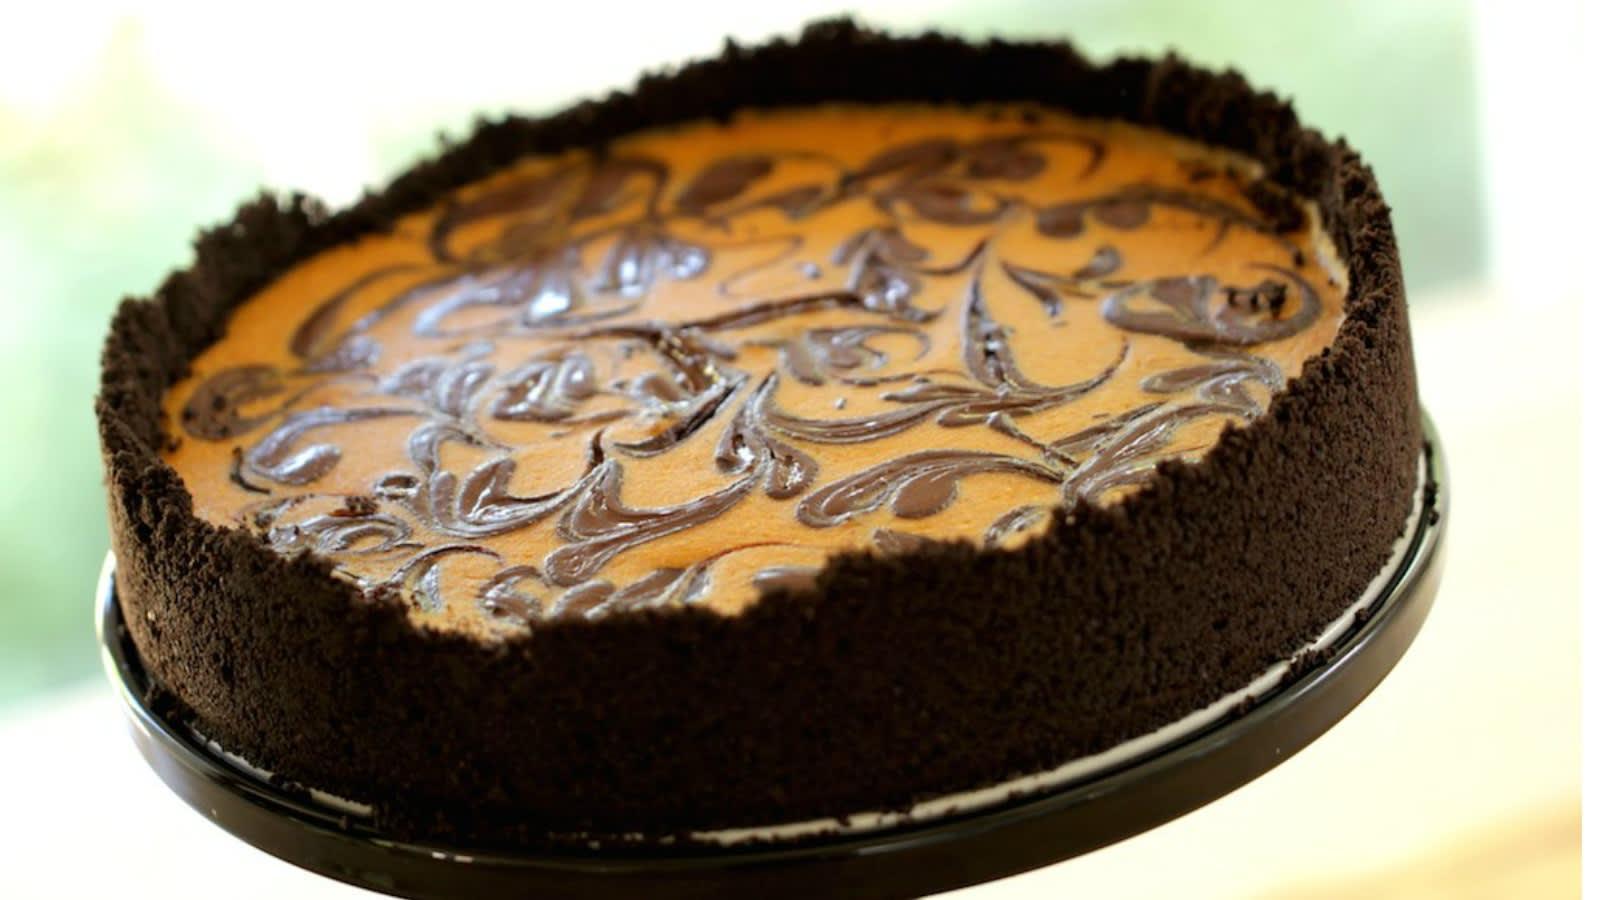 Pumpkin Cheesecake With Chocolate Swirl Entertaining With Beth